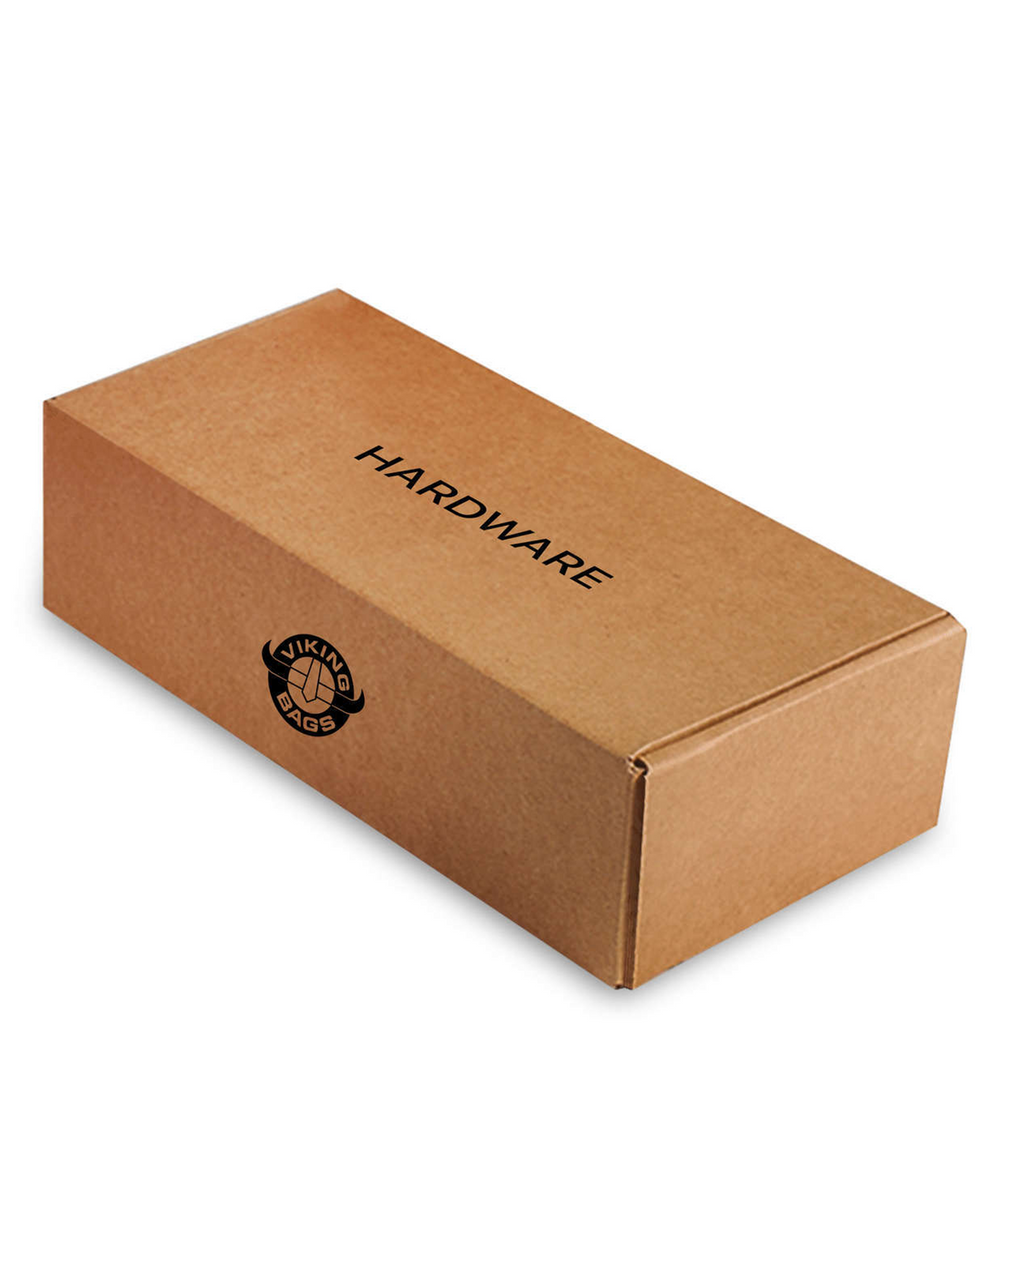 Victory Octane Charger Single Strap Studded Motorcycle Saddlebags Hardware Box